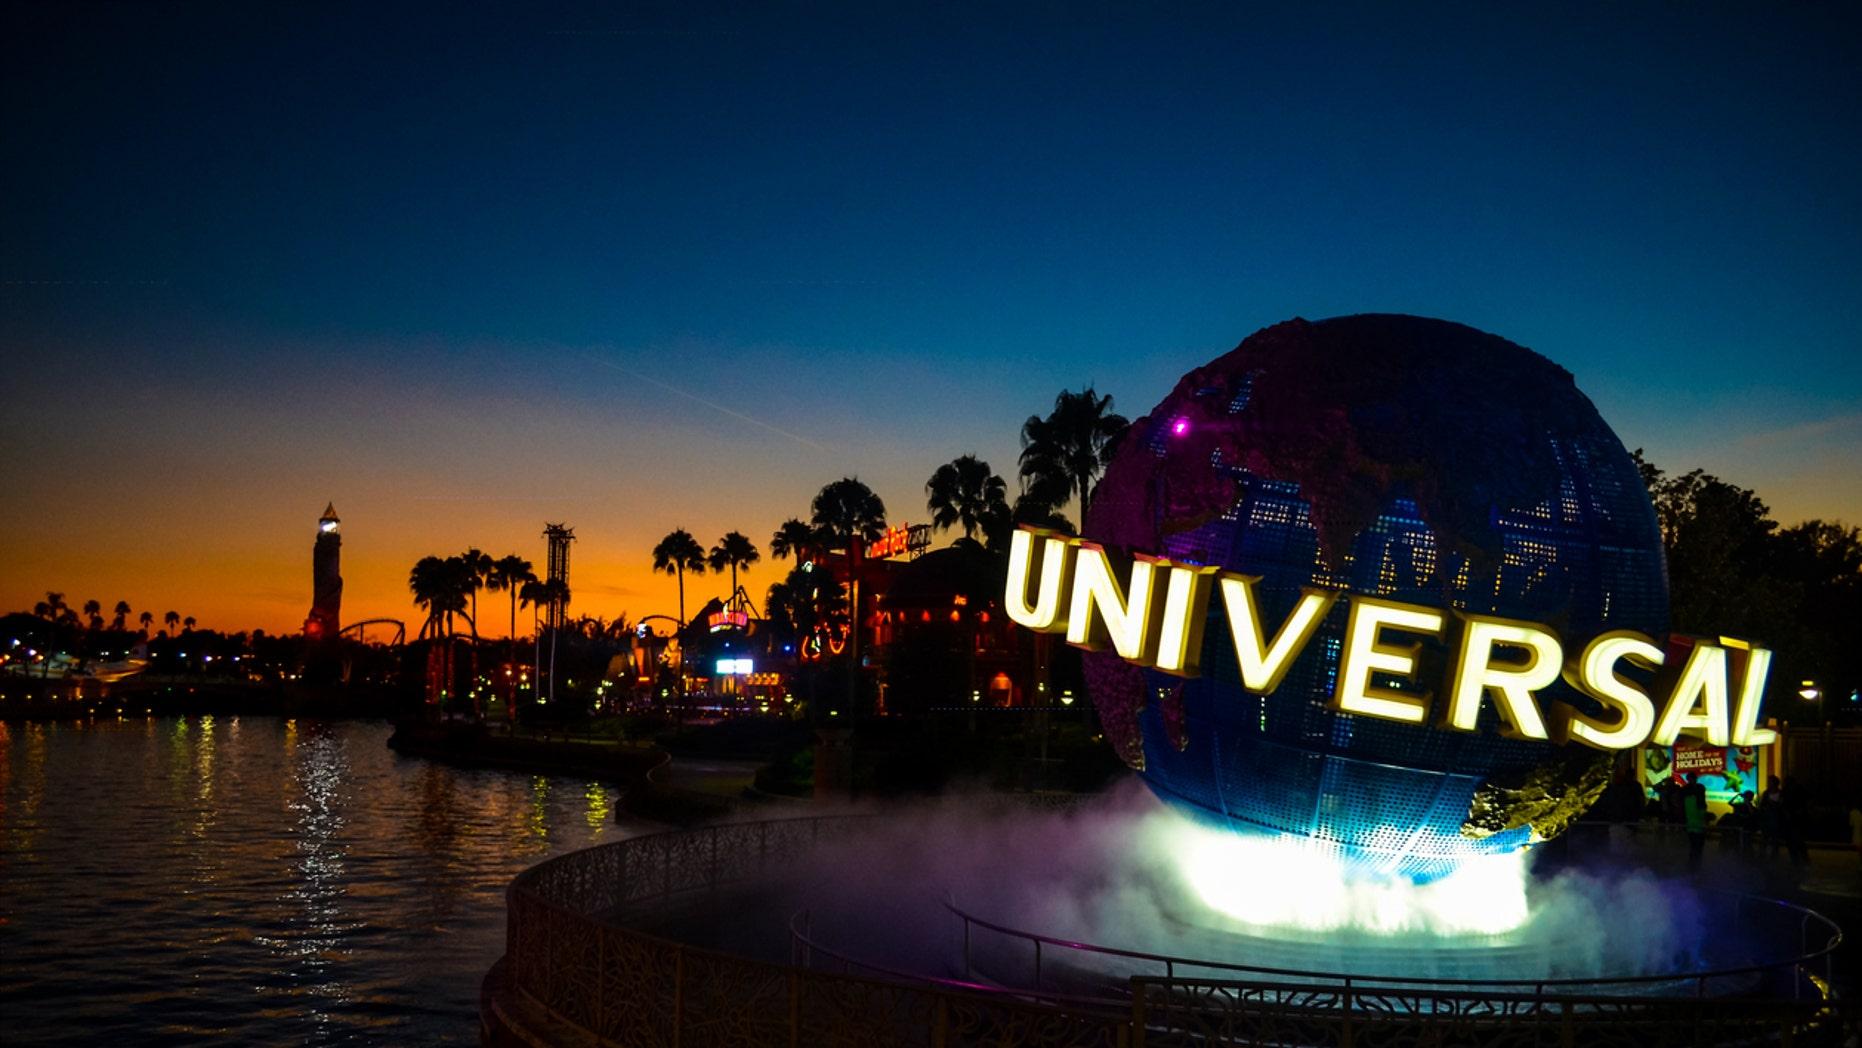 Orlando, FL, United States of America - December 6, 2012: a Sunset at the Universal Studios Resort in Orlando